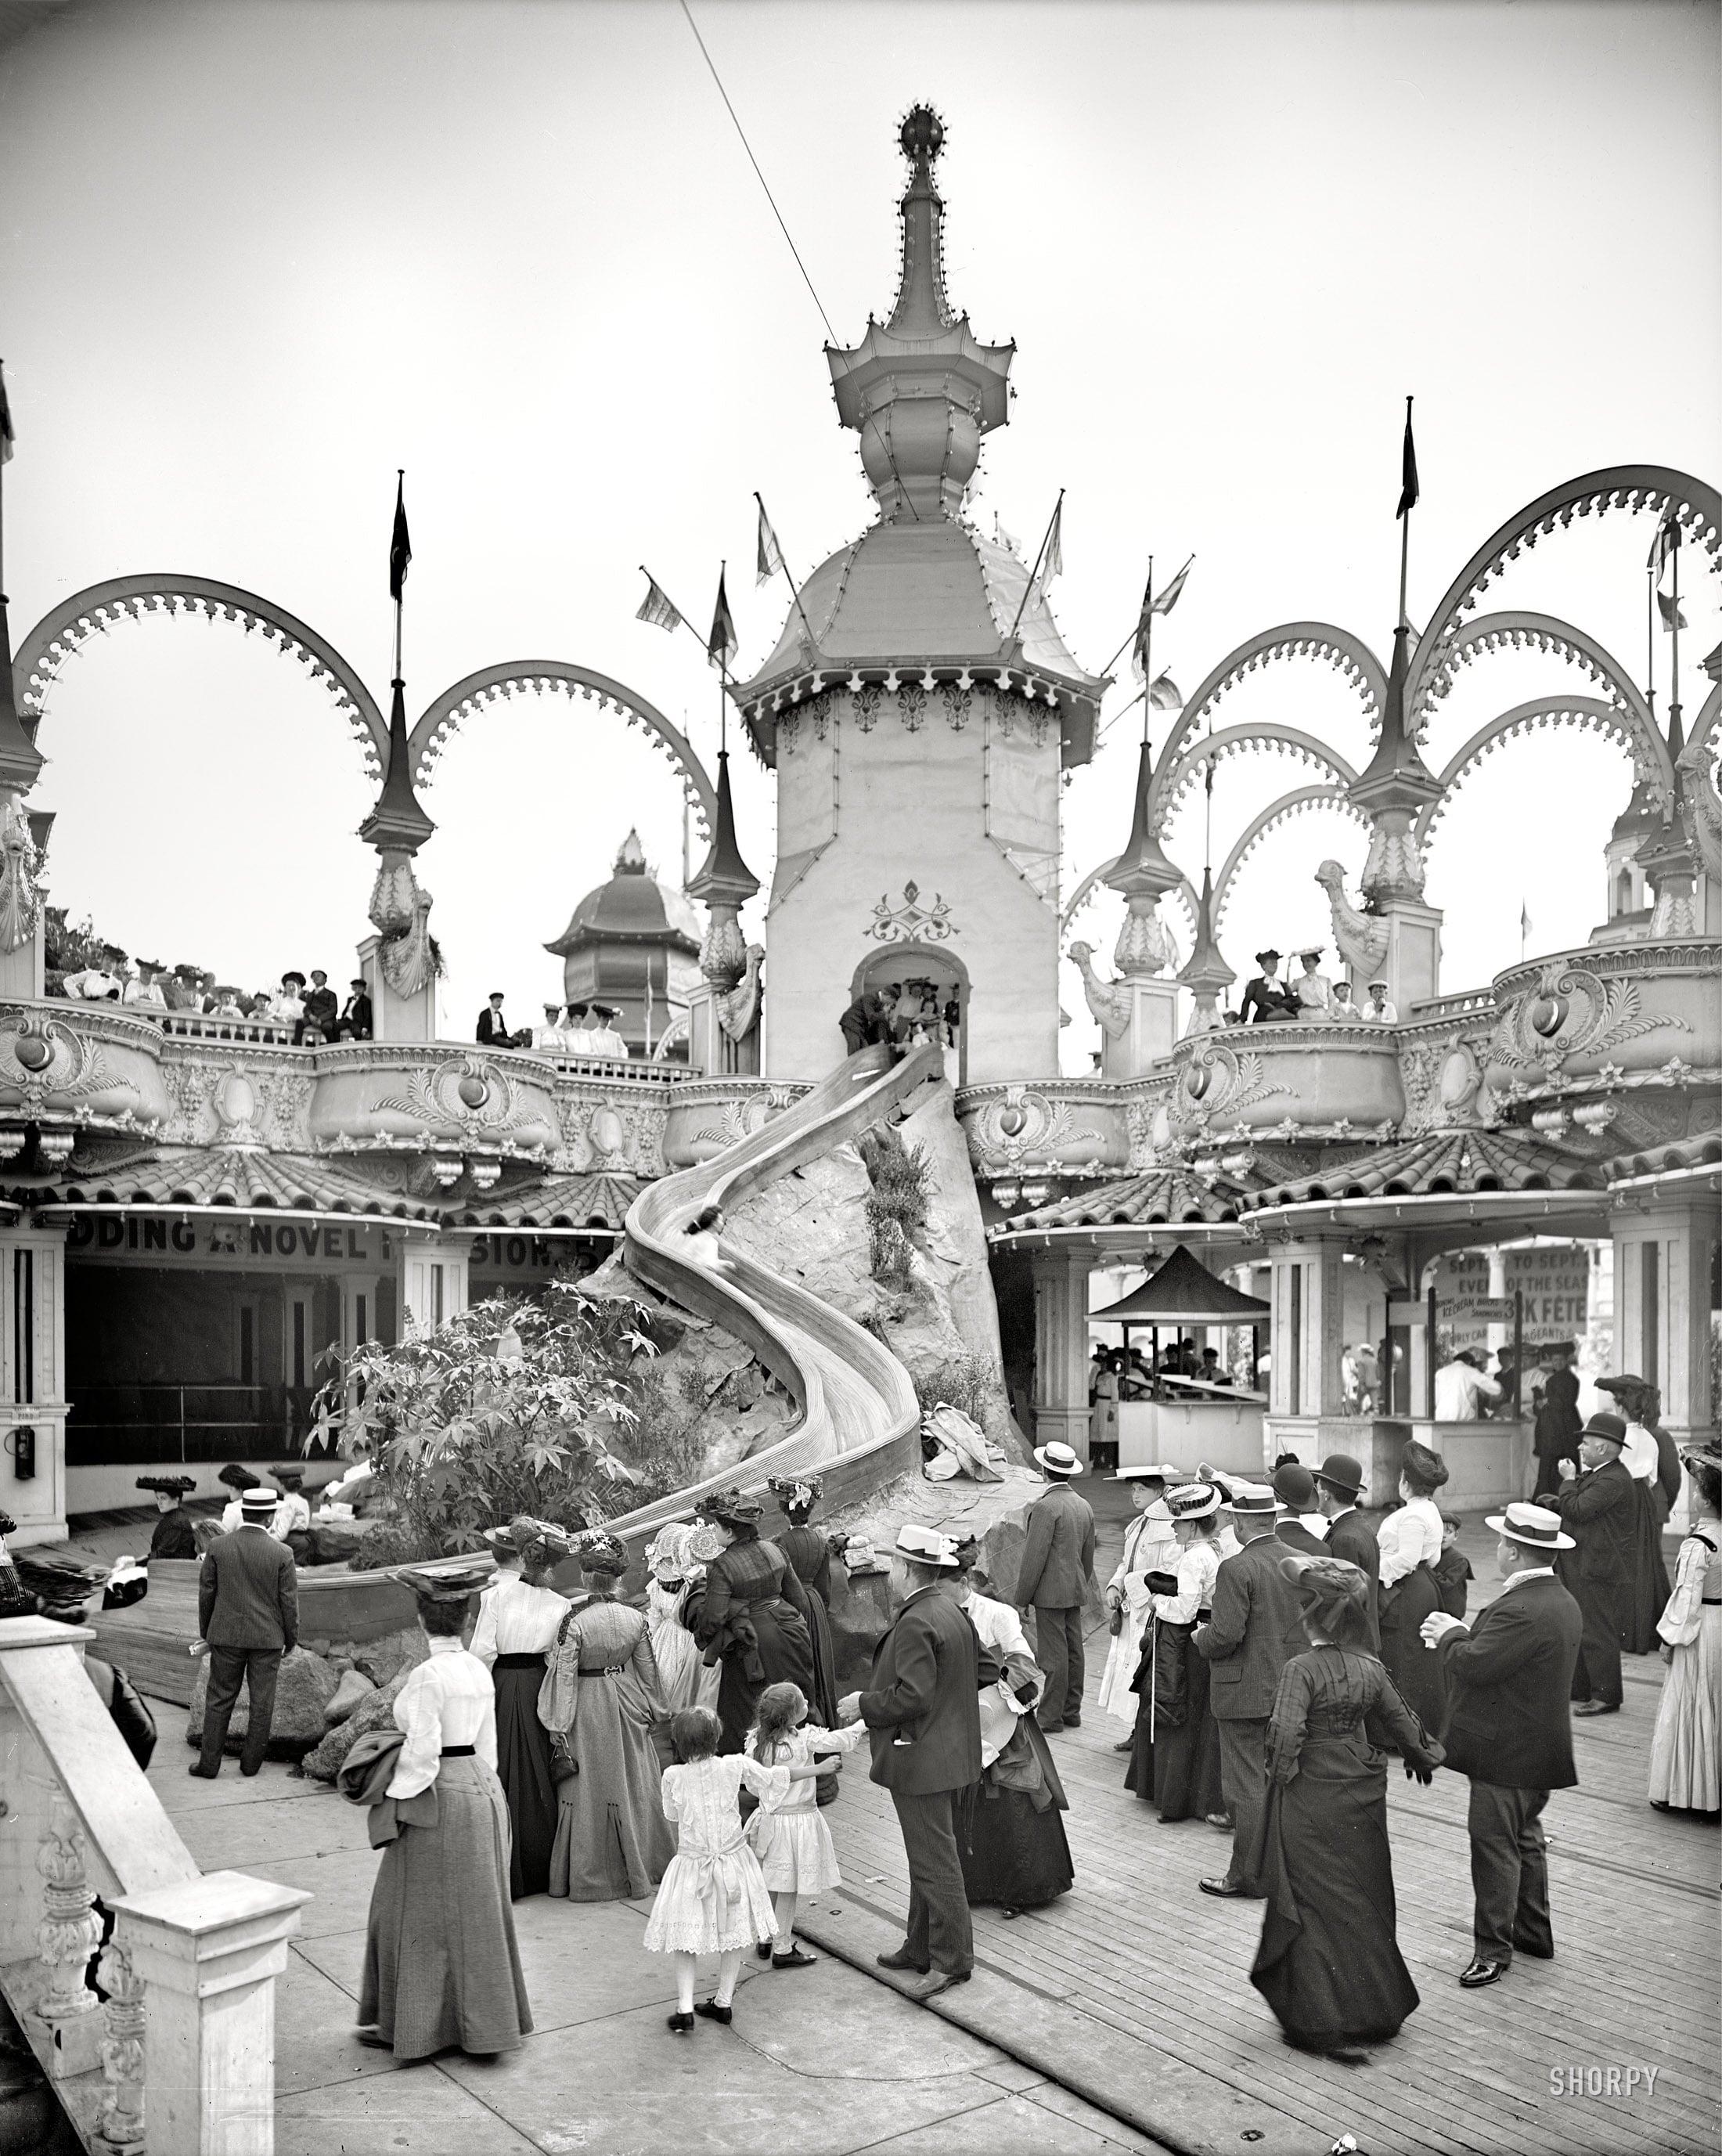 The Helter Skelter ride at Luna Park, Coney Island. 1905. (h/t,  Shorpy )